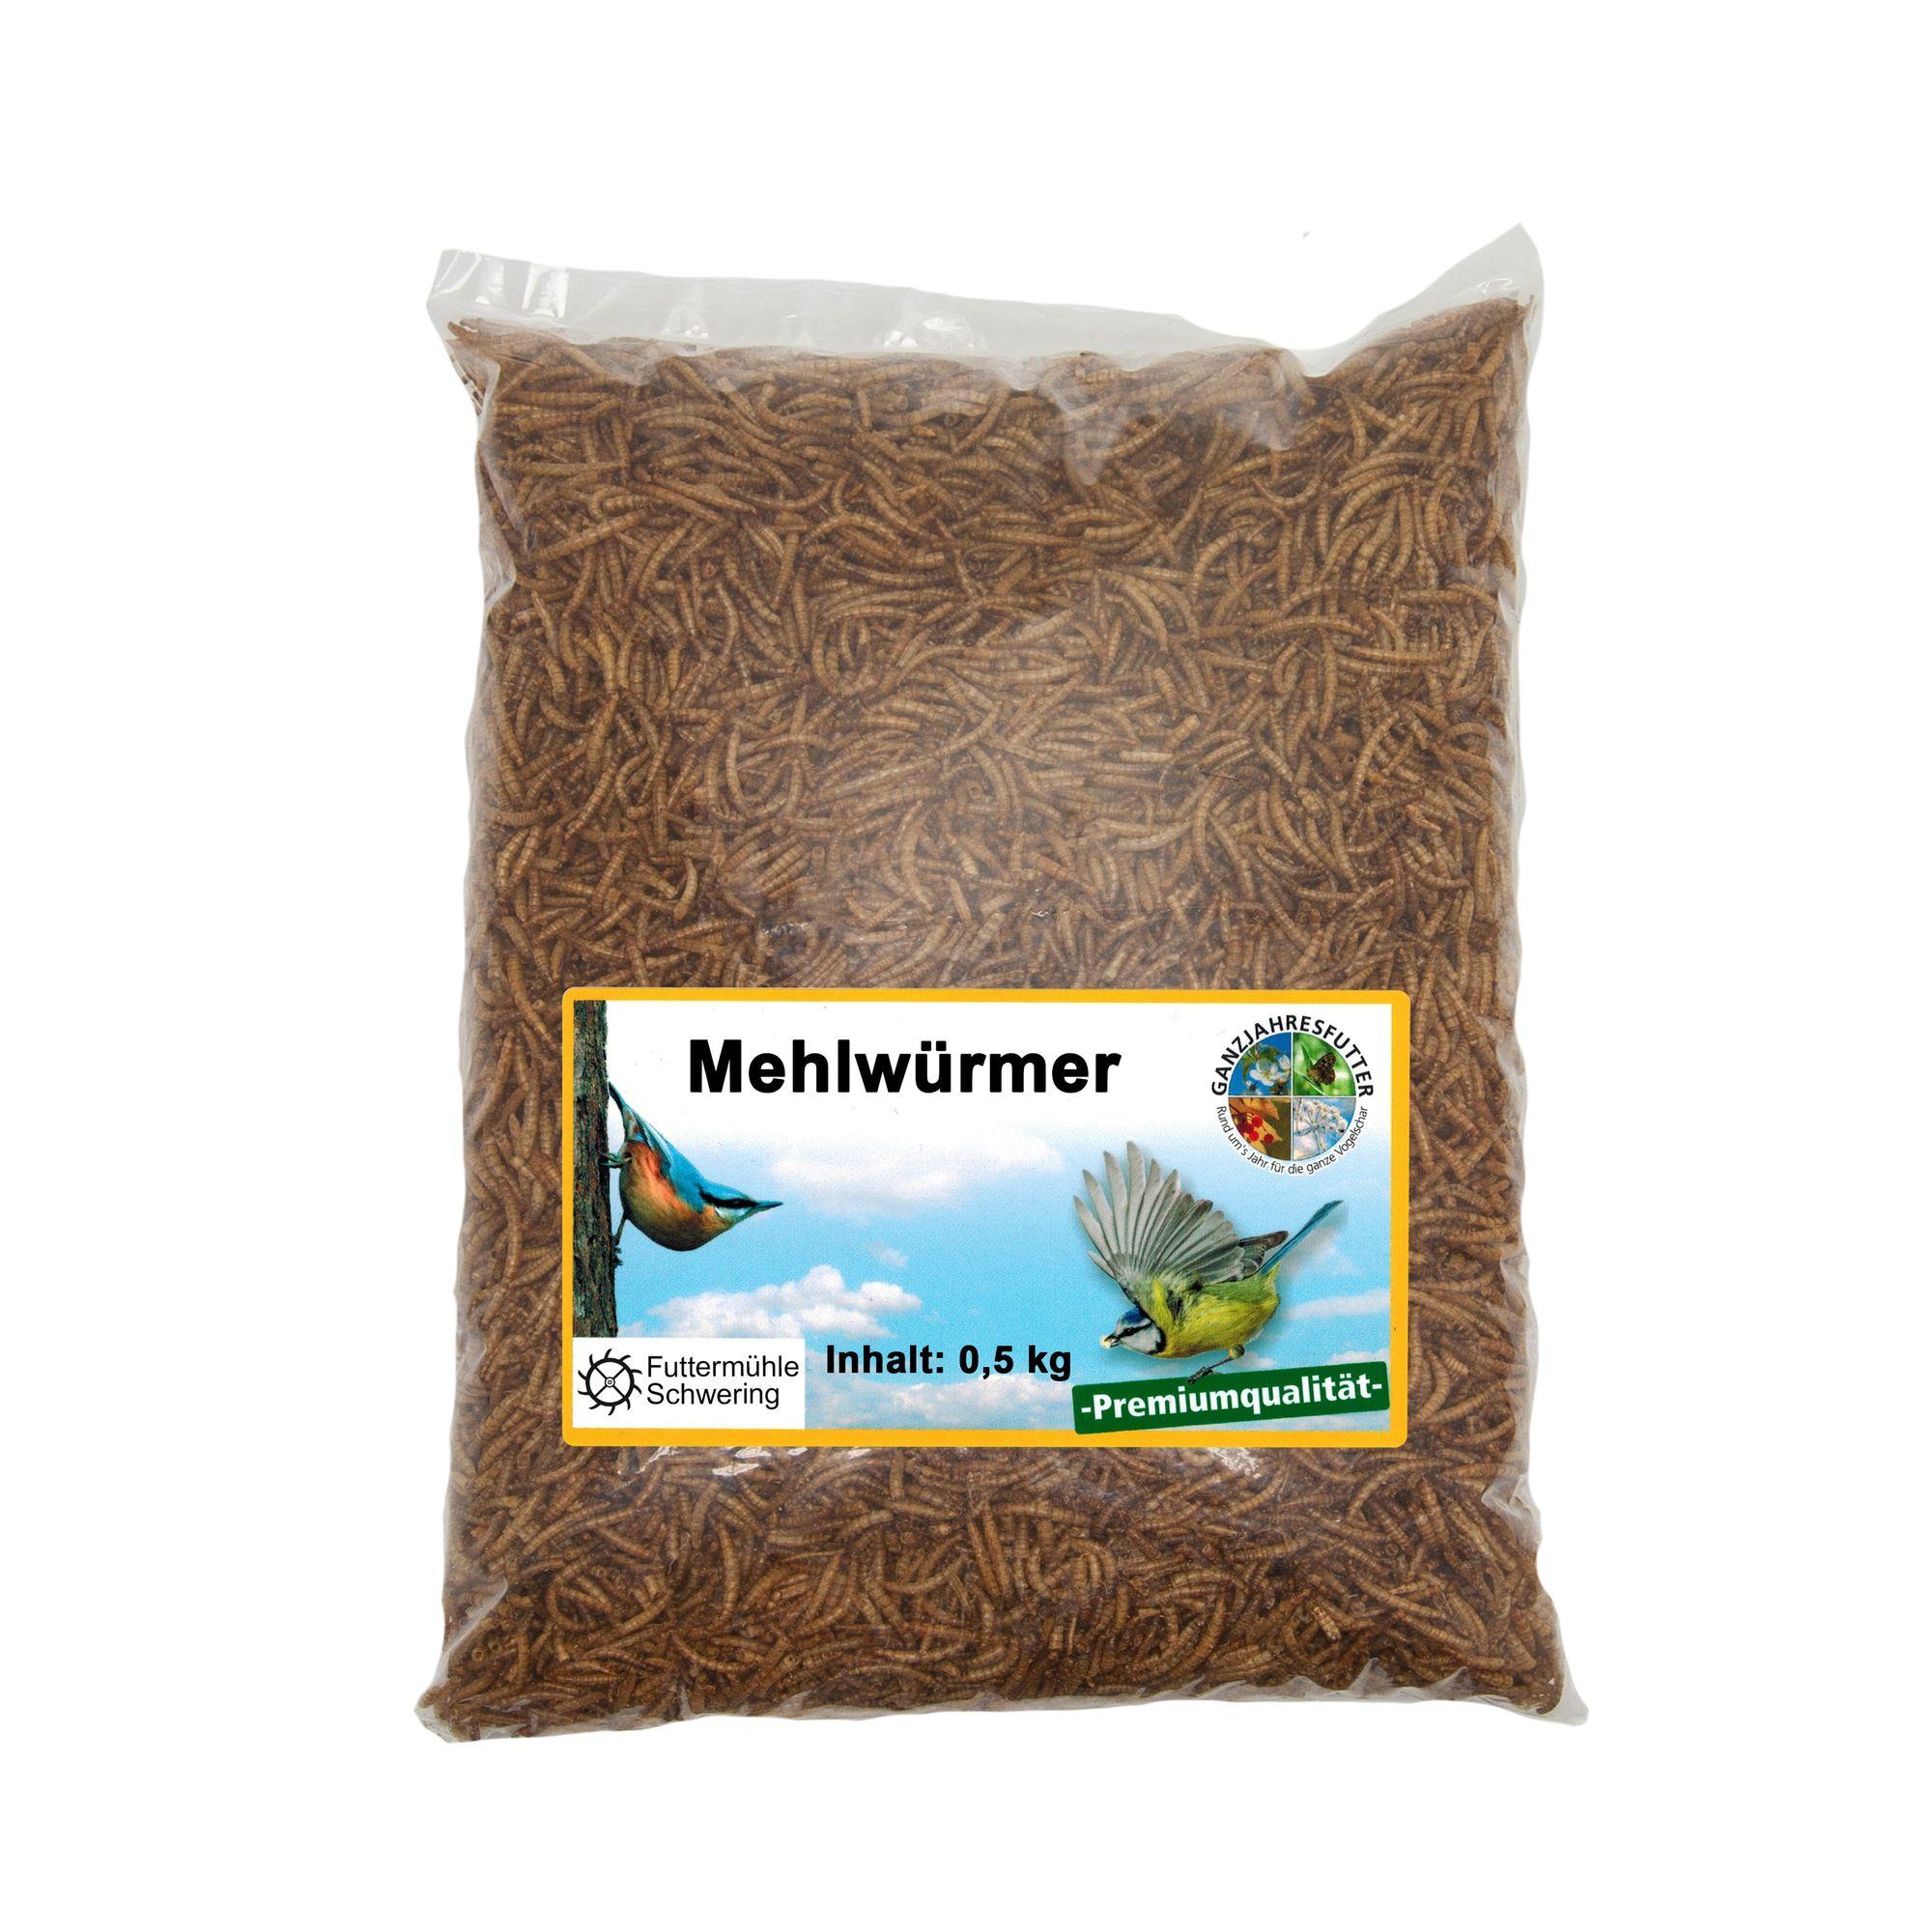 Mehlwürmer getrocknet 500g Beutel